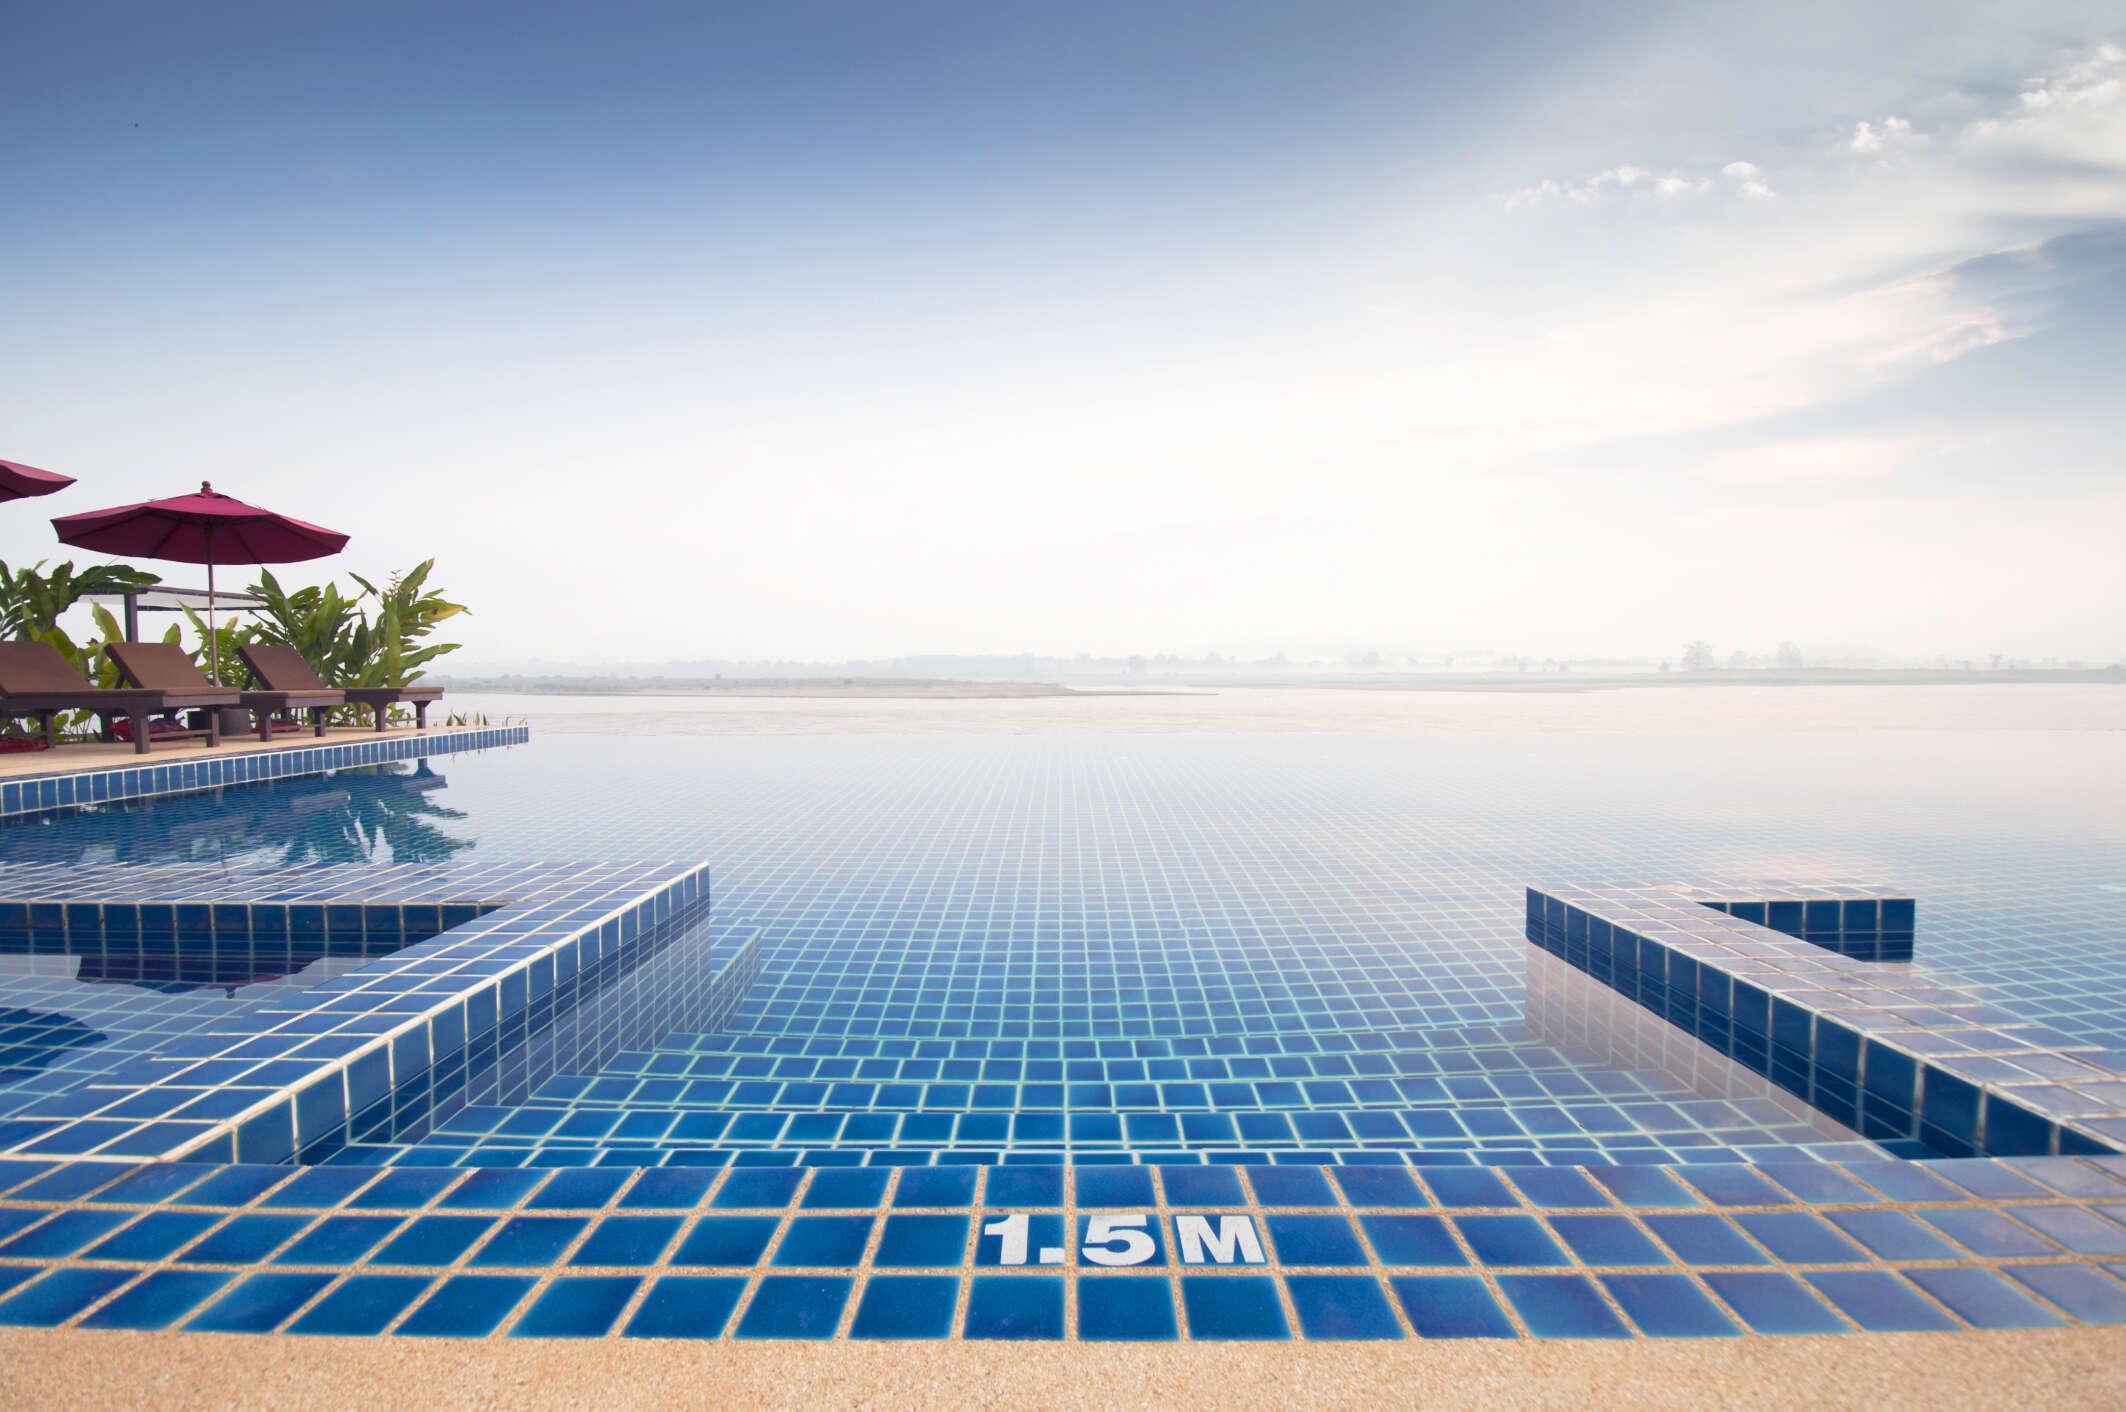 Best pools in Scottsdale, AZ